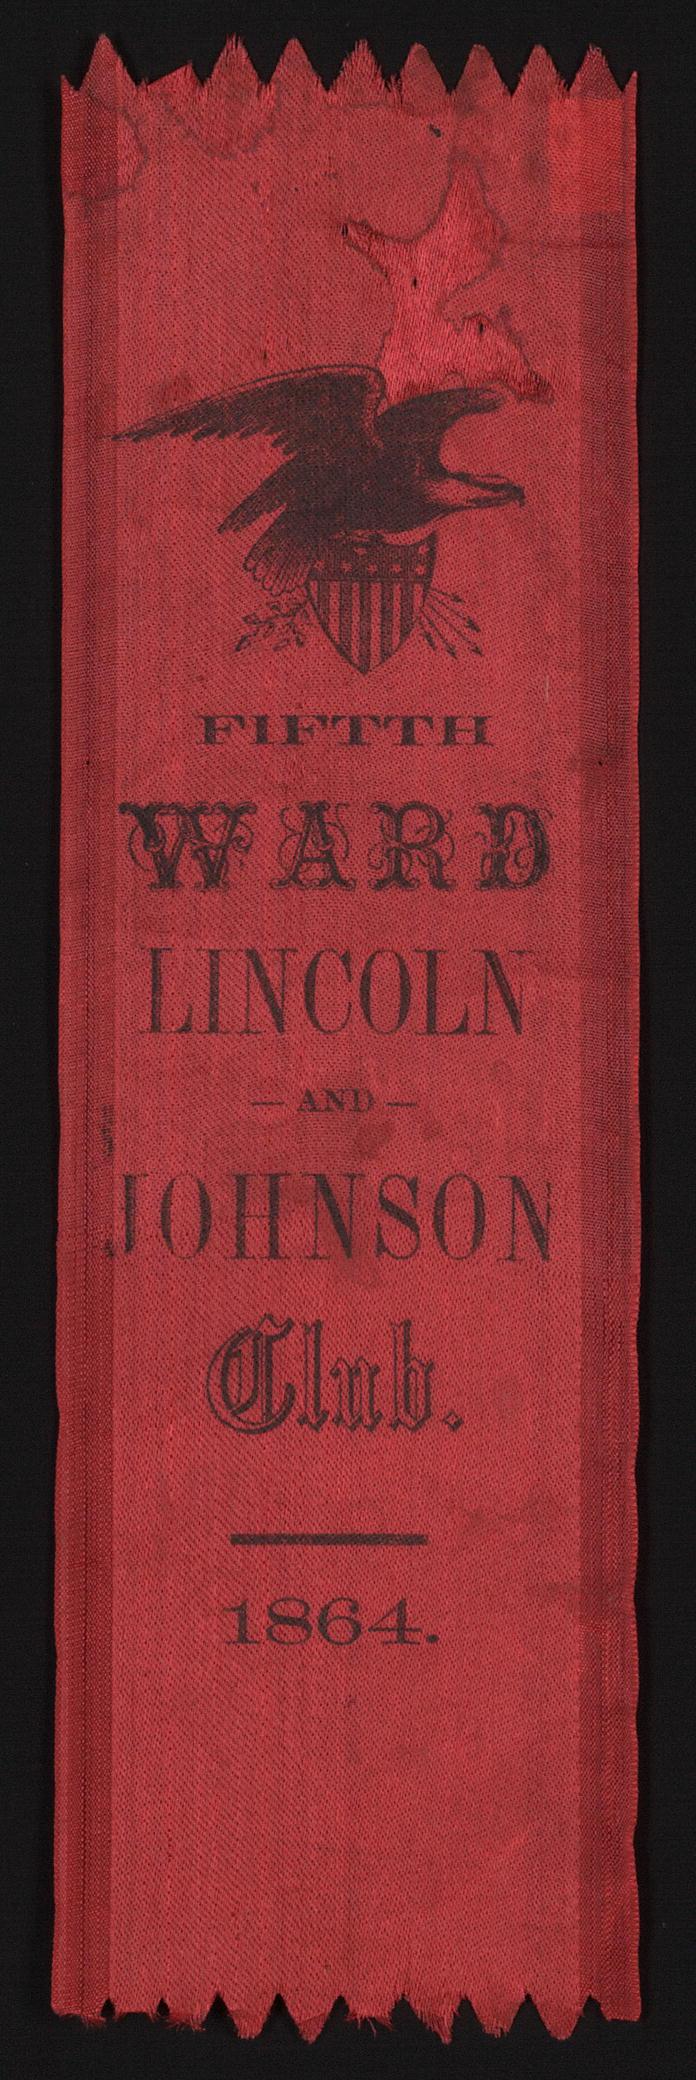 Fifth Ward Lincoln and Johnson Club   Circa 1864